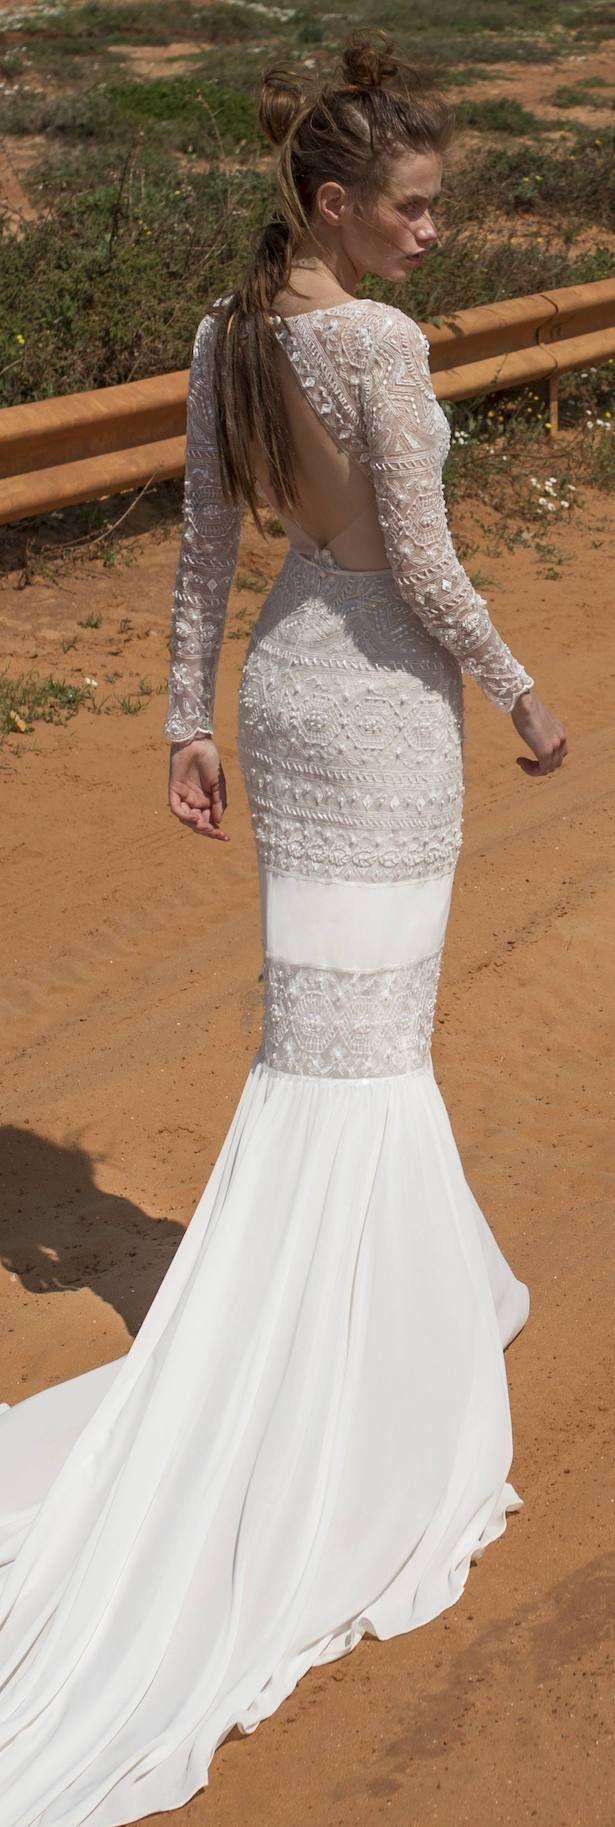 Wedding - Wedding Dresses By Limor Rosen Bridal Couture 2018 Free Spirit Collection